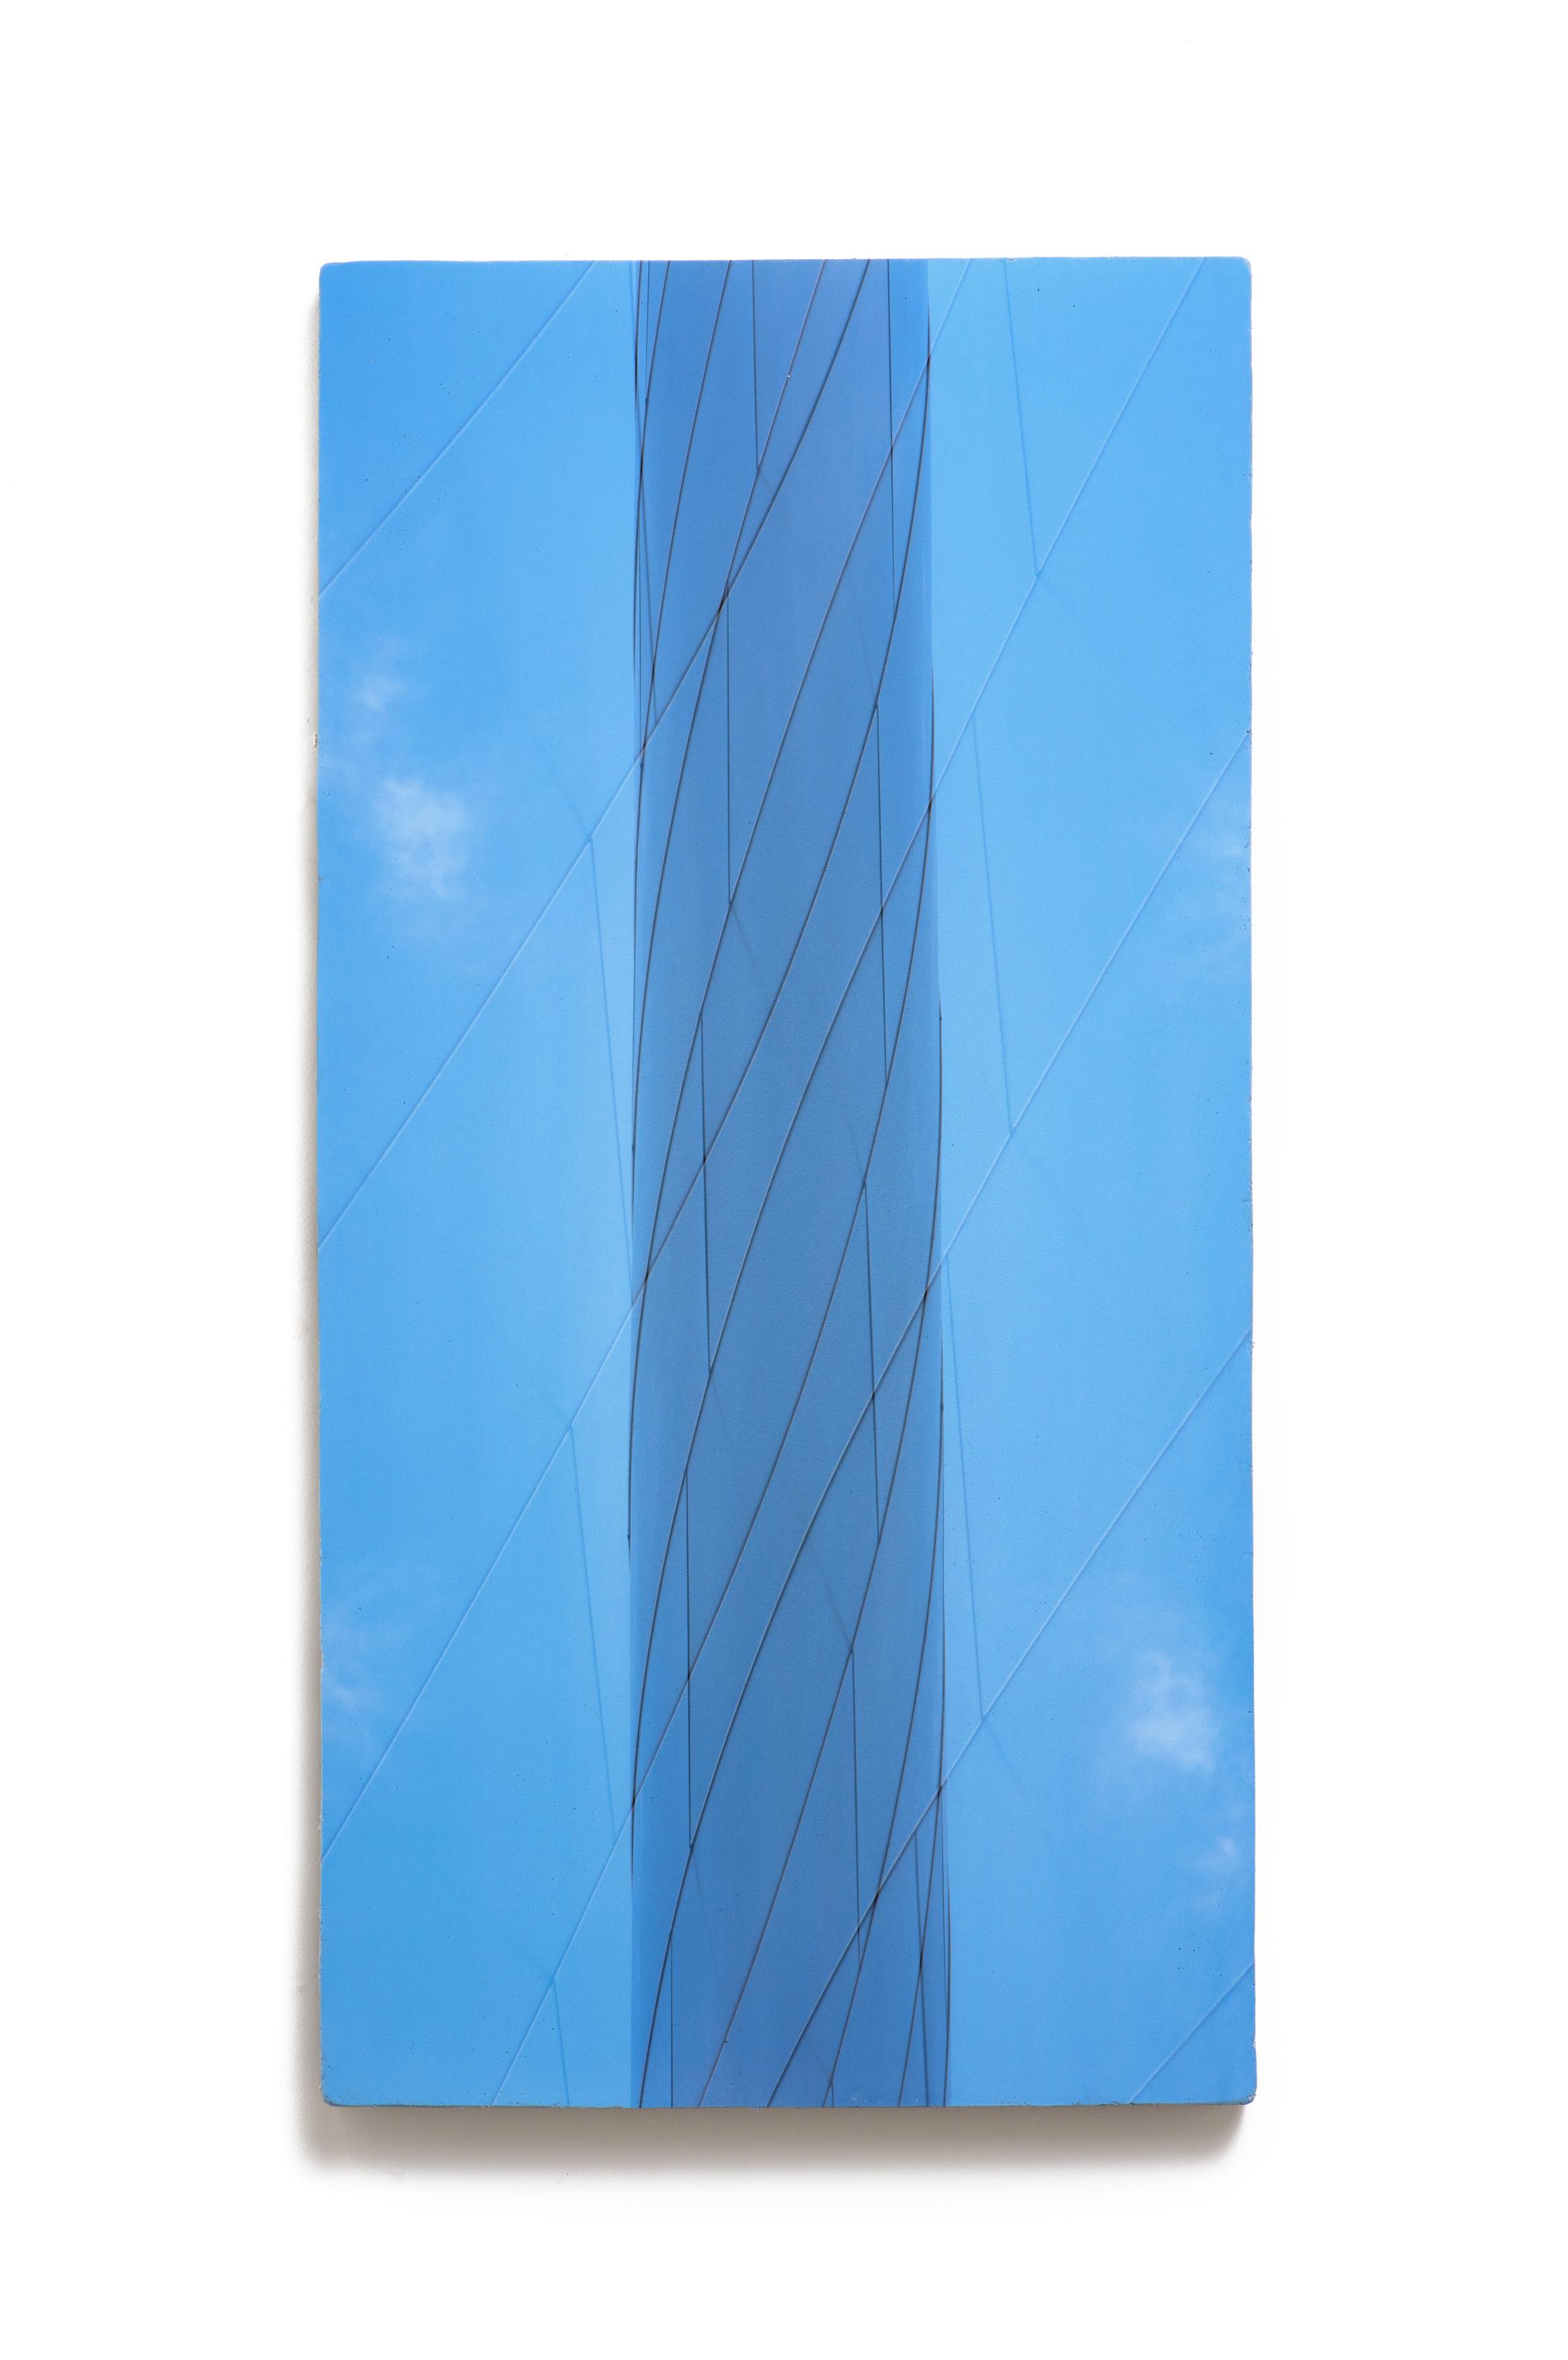 Counterform Light Column , 2017 UV ink on concrete 40 1/2 × 20 1/2 × 1 1/2 in Unique